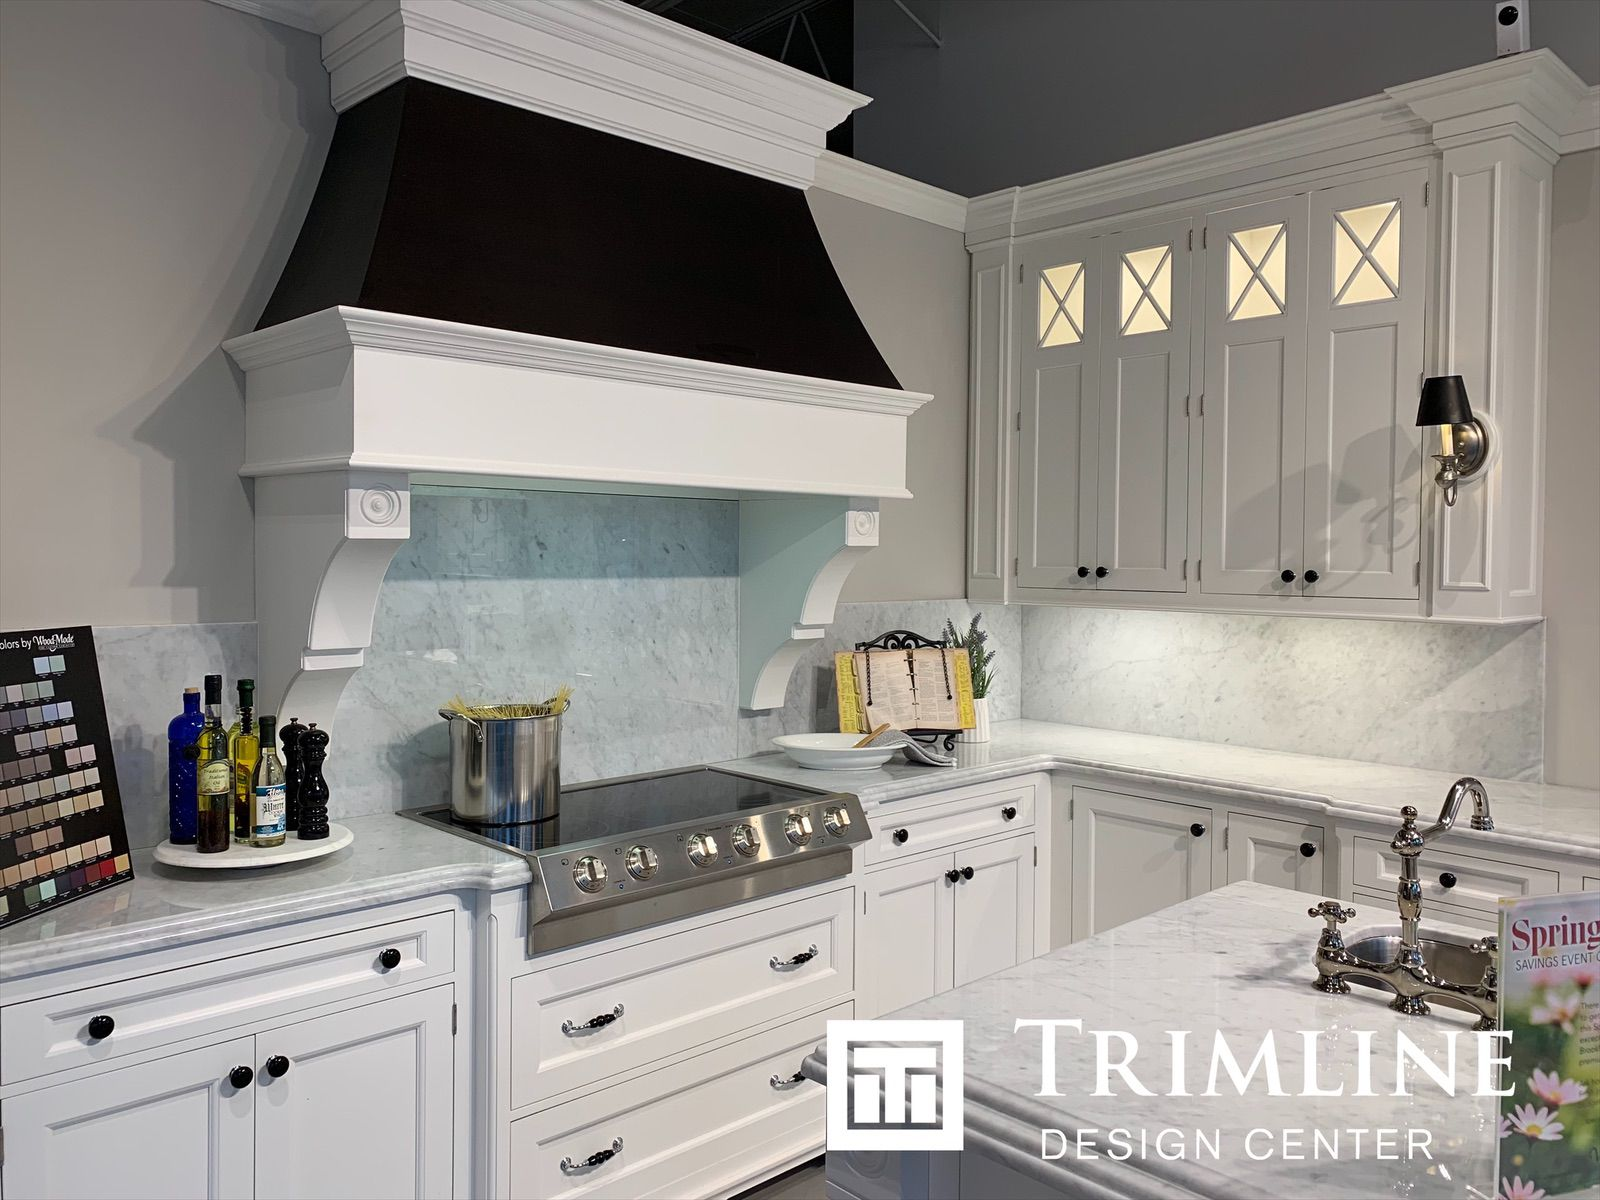 Beautiful Wood Cherry Good Compliments This All White Kitchen Kitchen Design Summer Kitchen Custom Kitchen Cabinets